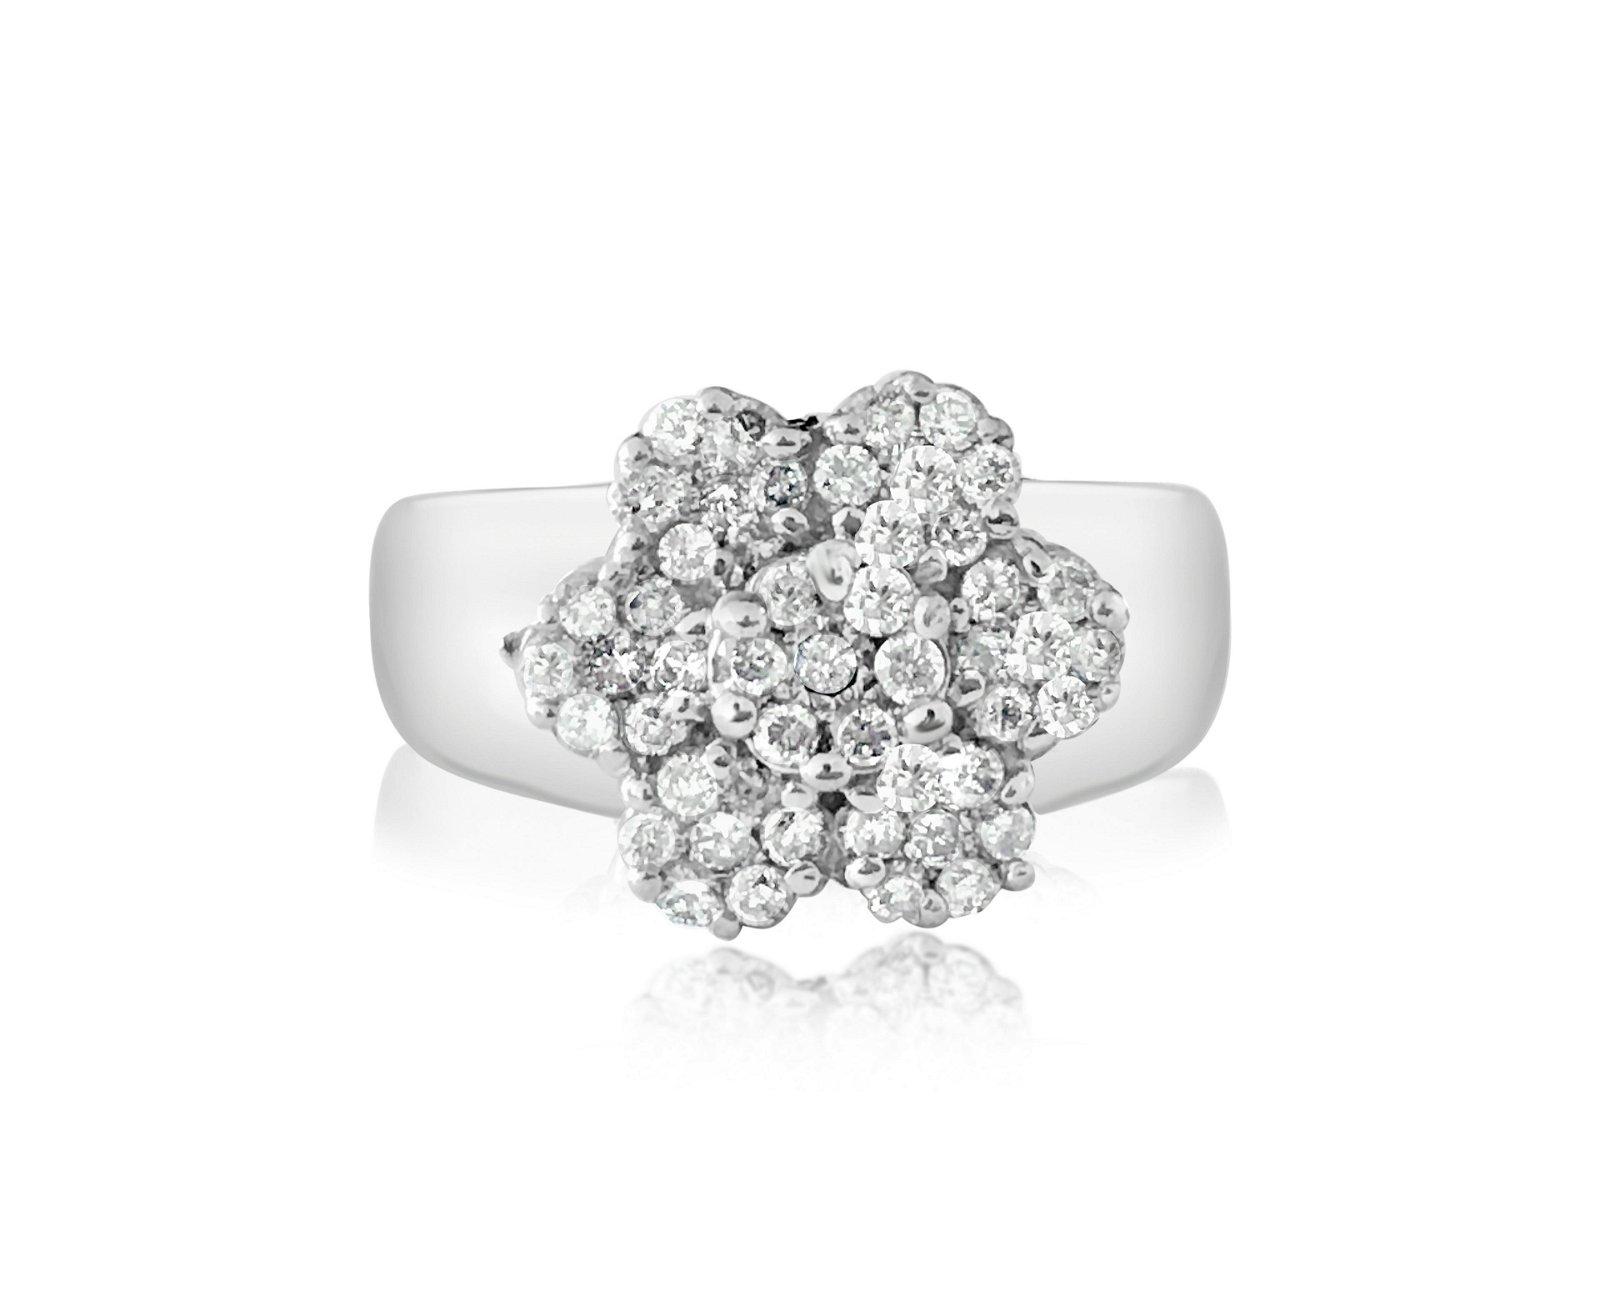 Vintage 1.50 Carat Diamonds in 14kt white gold.